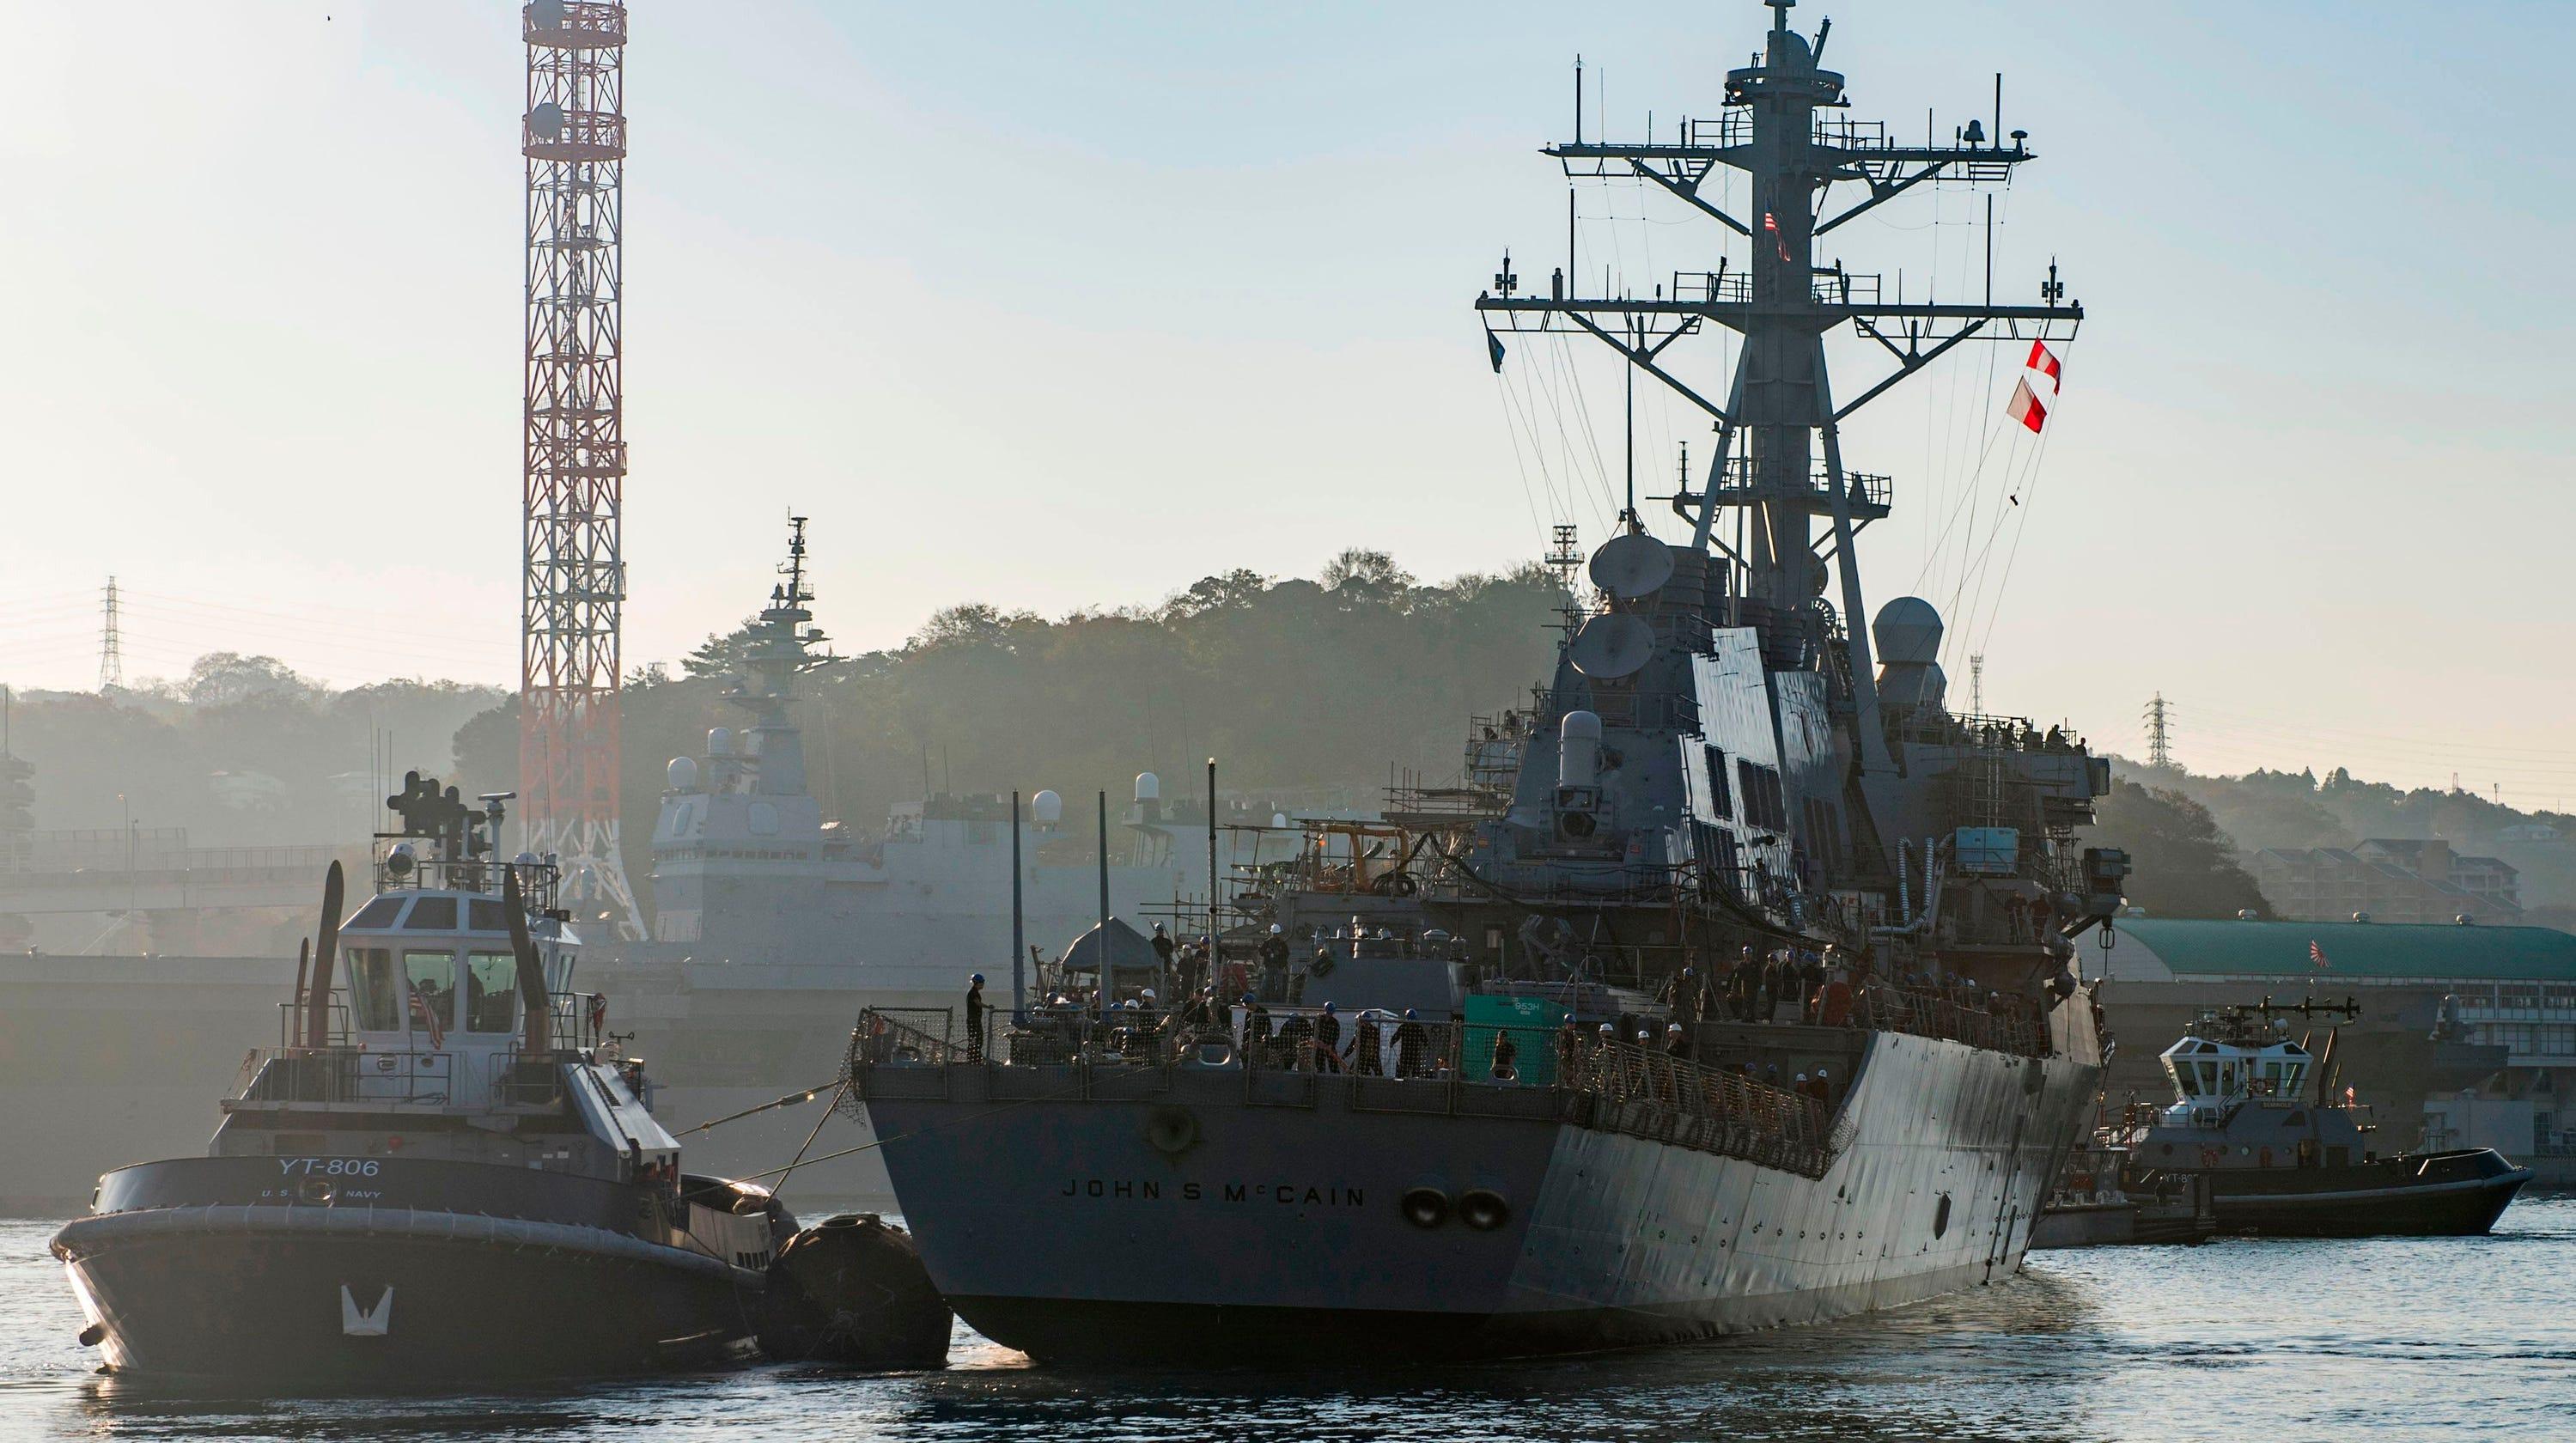 Shanahan to probe USS John McCain incident during Trump